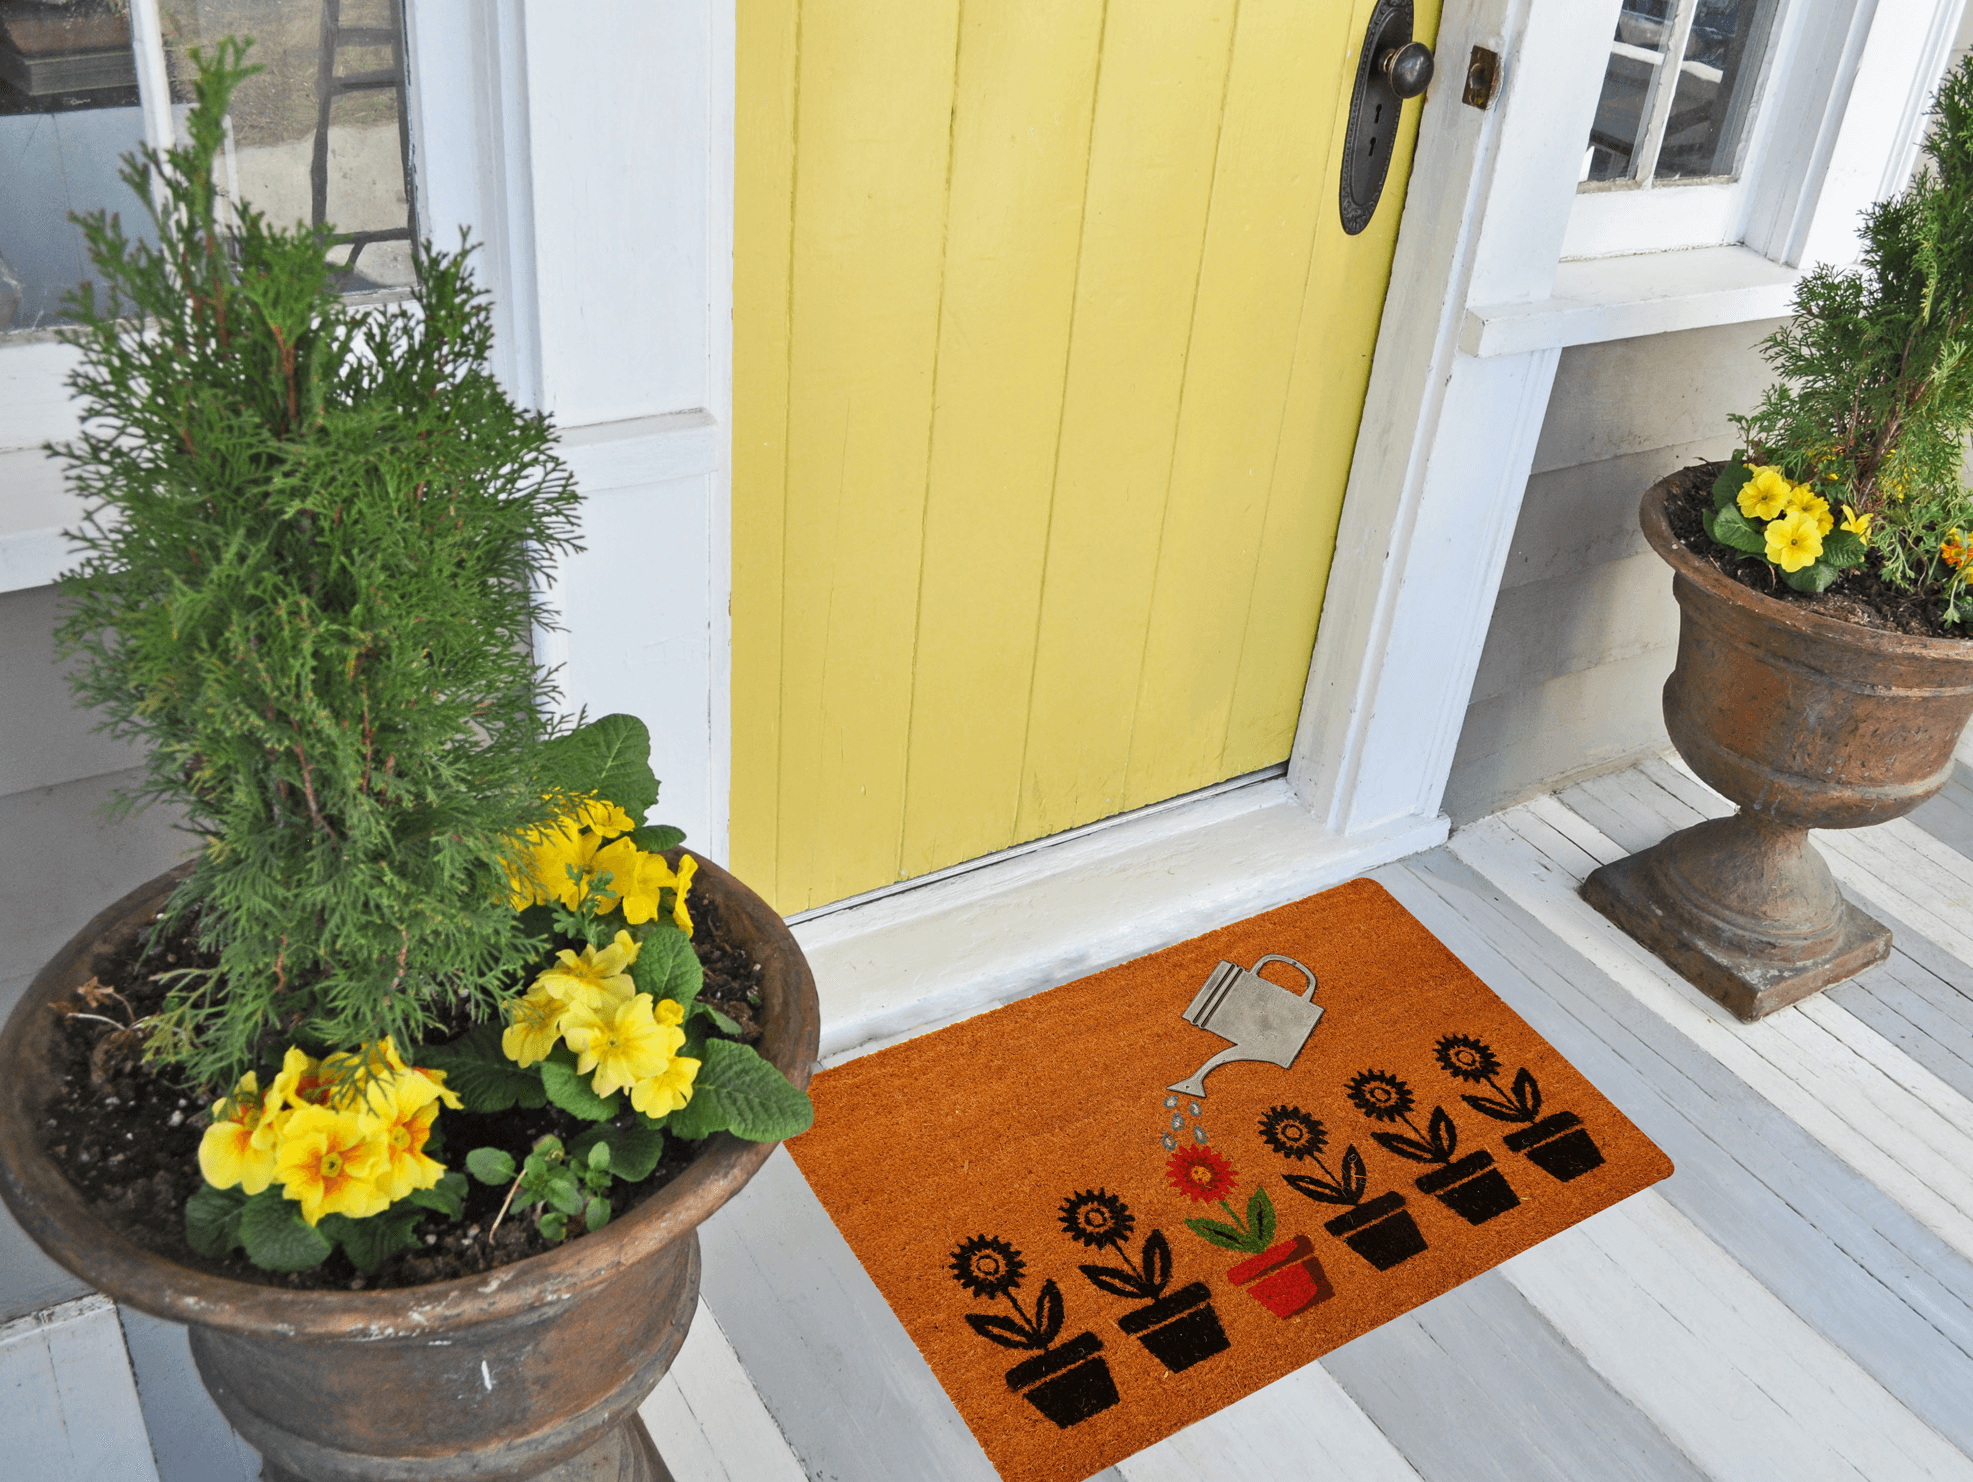 7 Practical and Fun Housewarming Gift Ideas